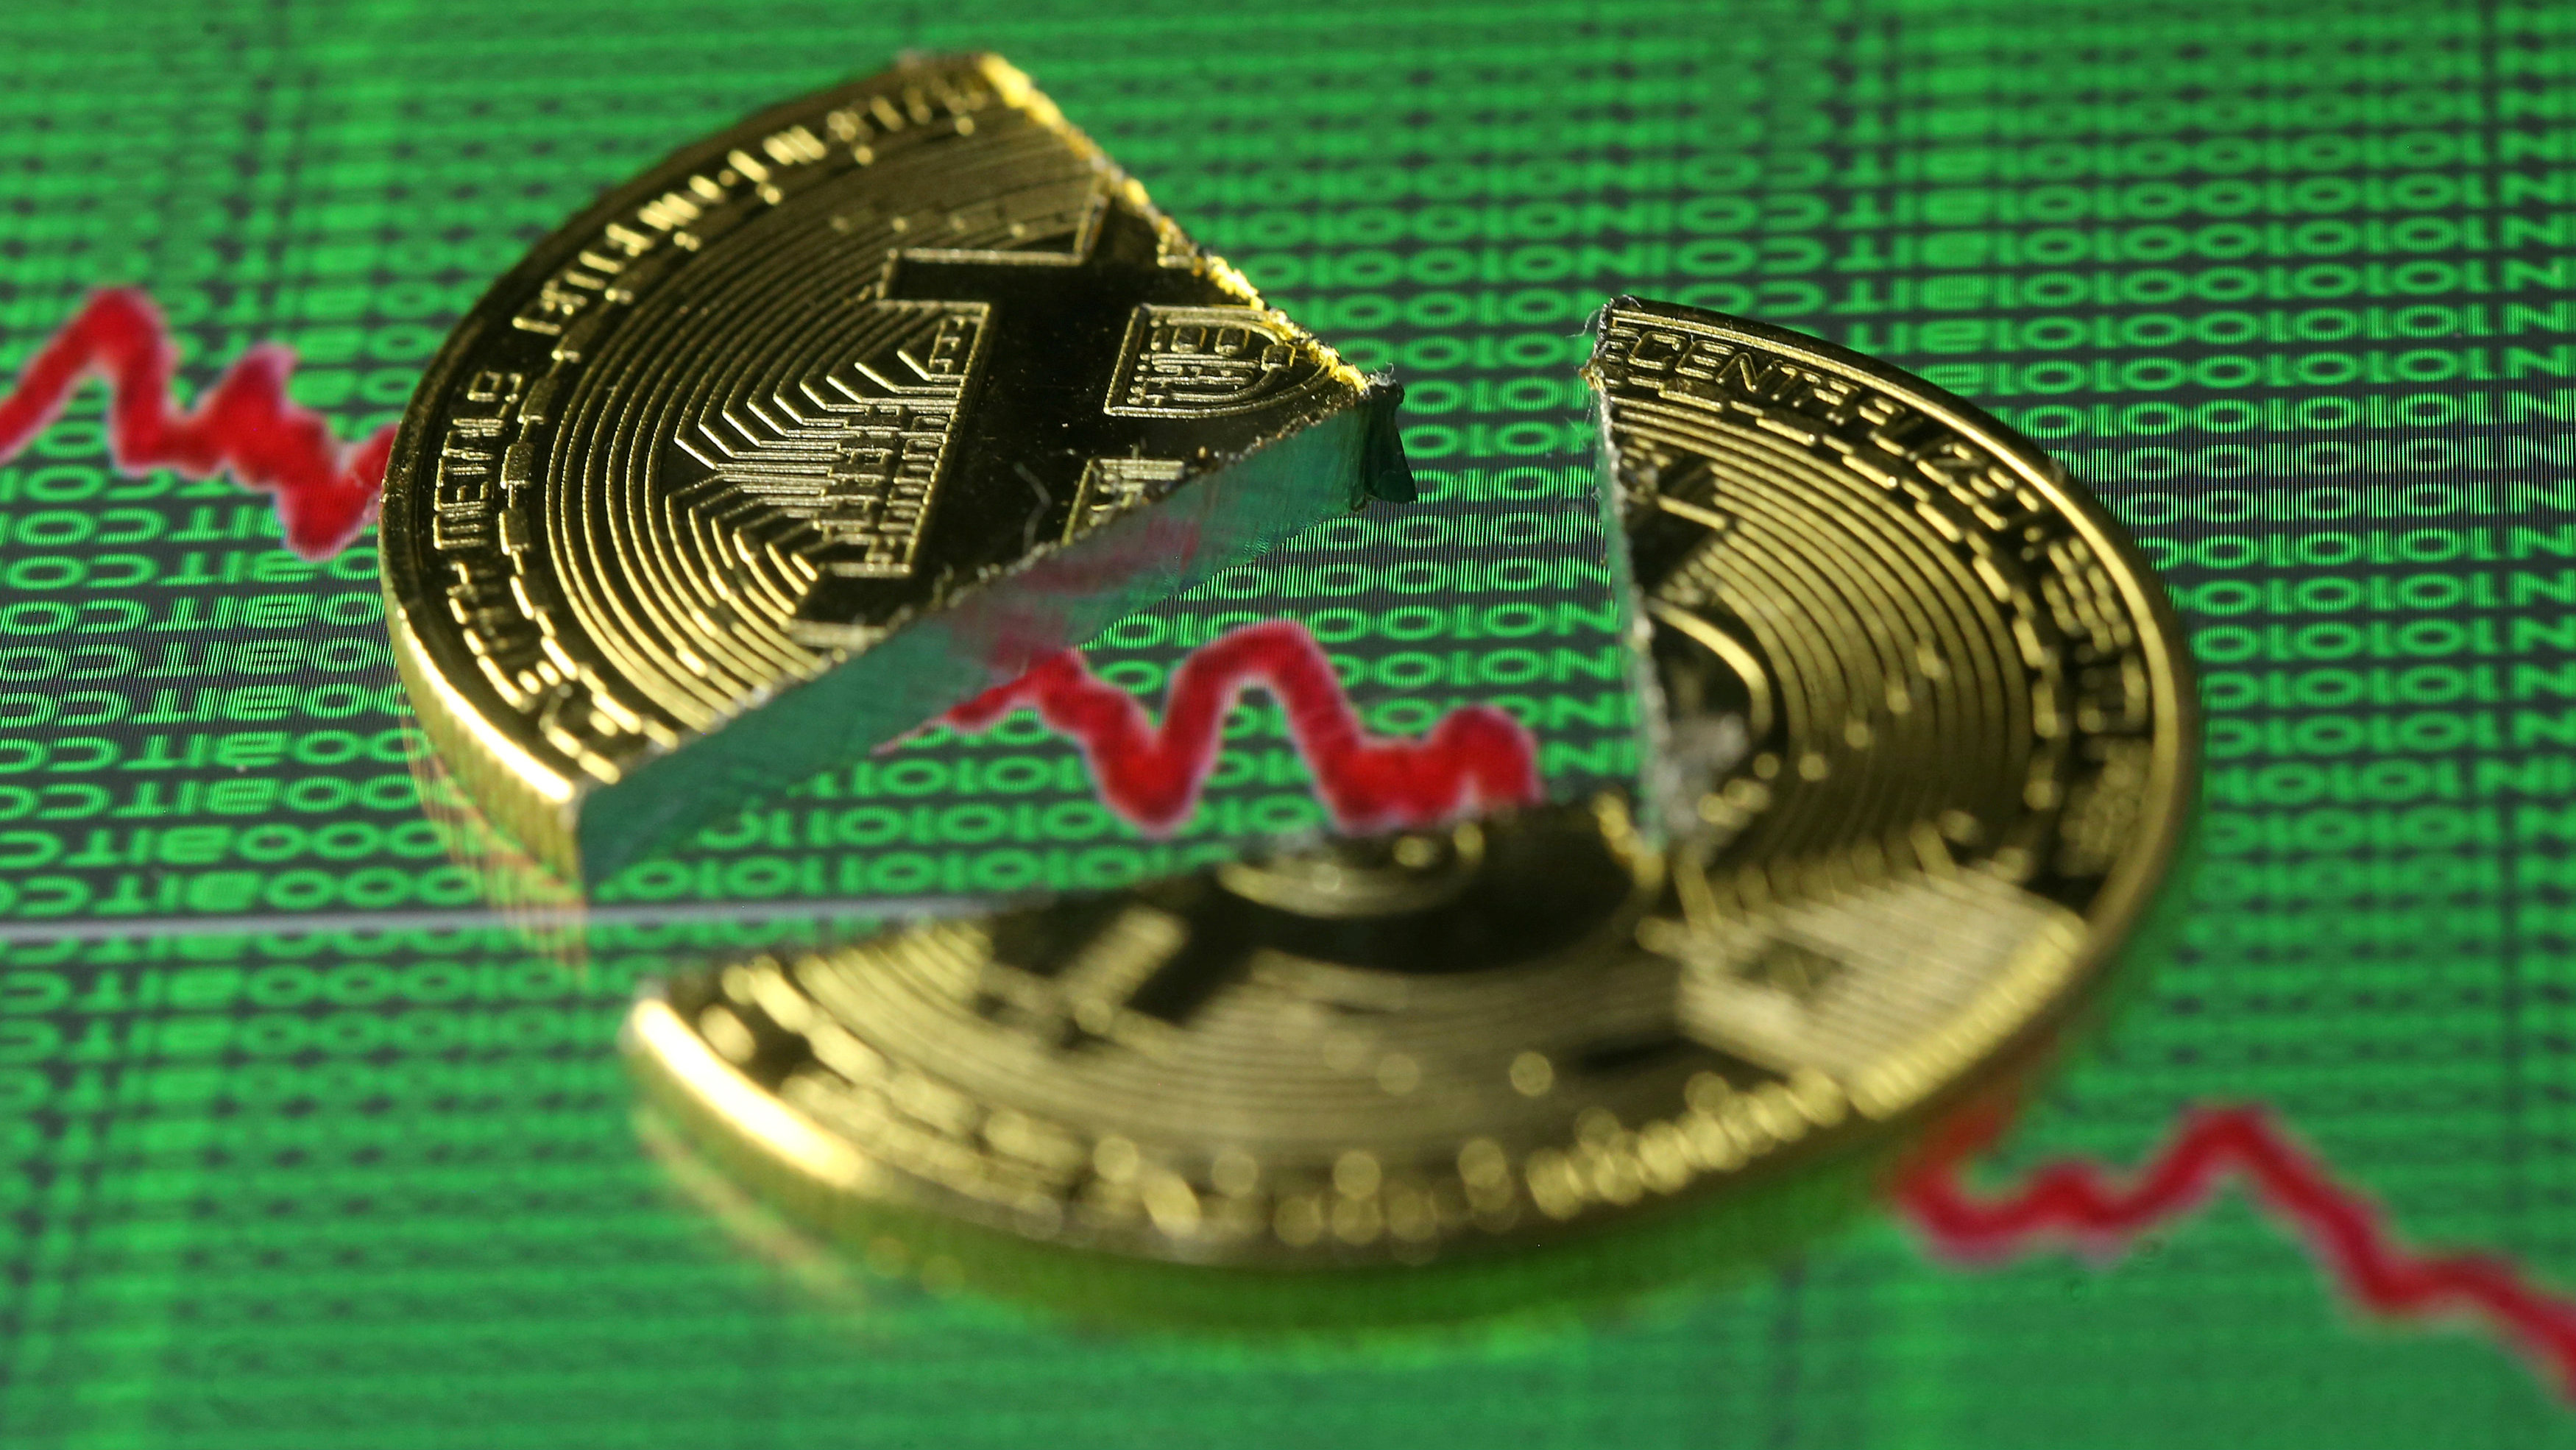 Broken representation of the Bitcoin virtual currency